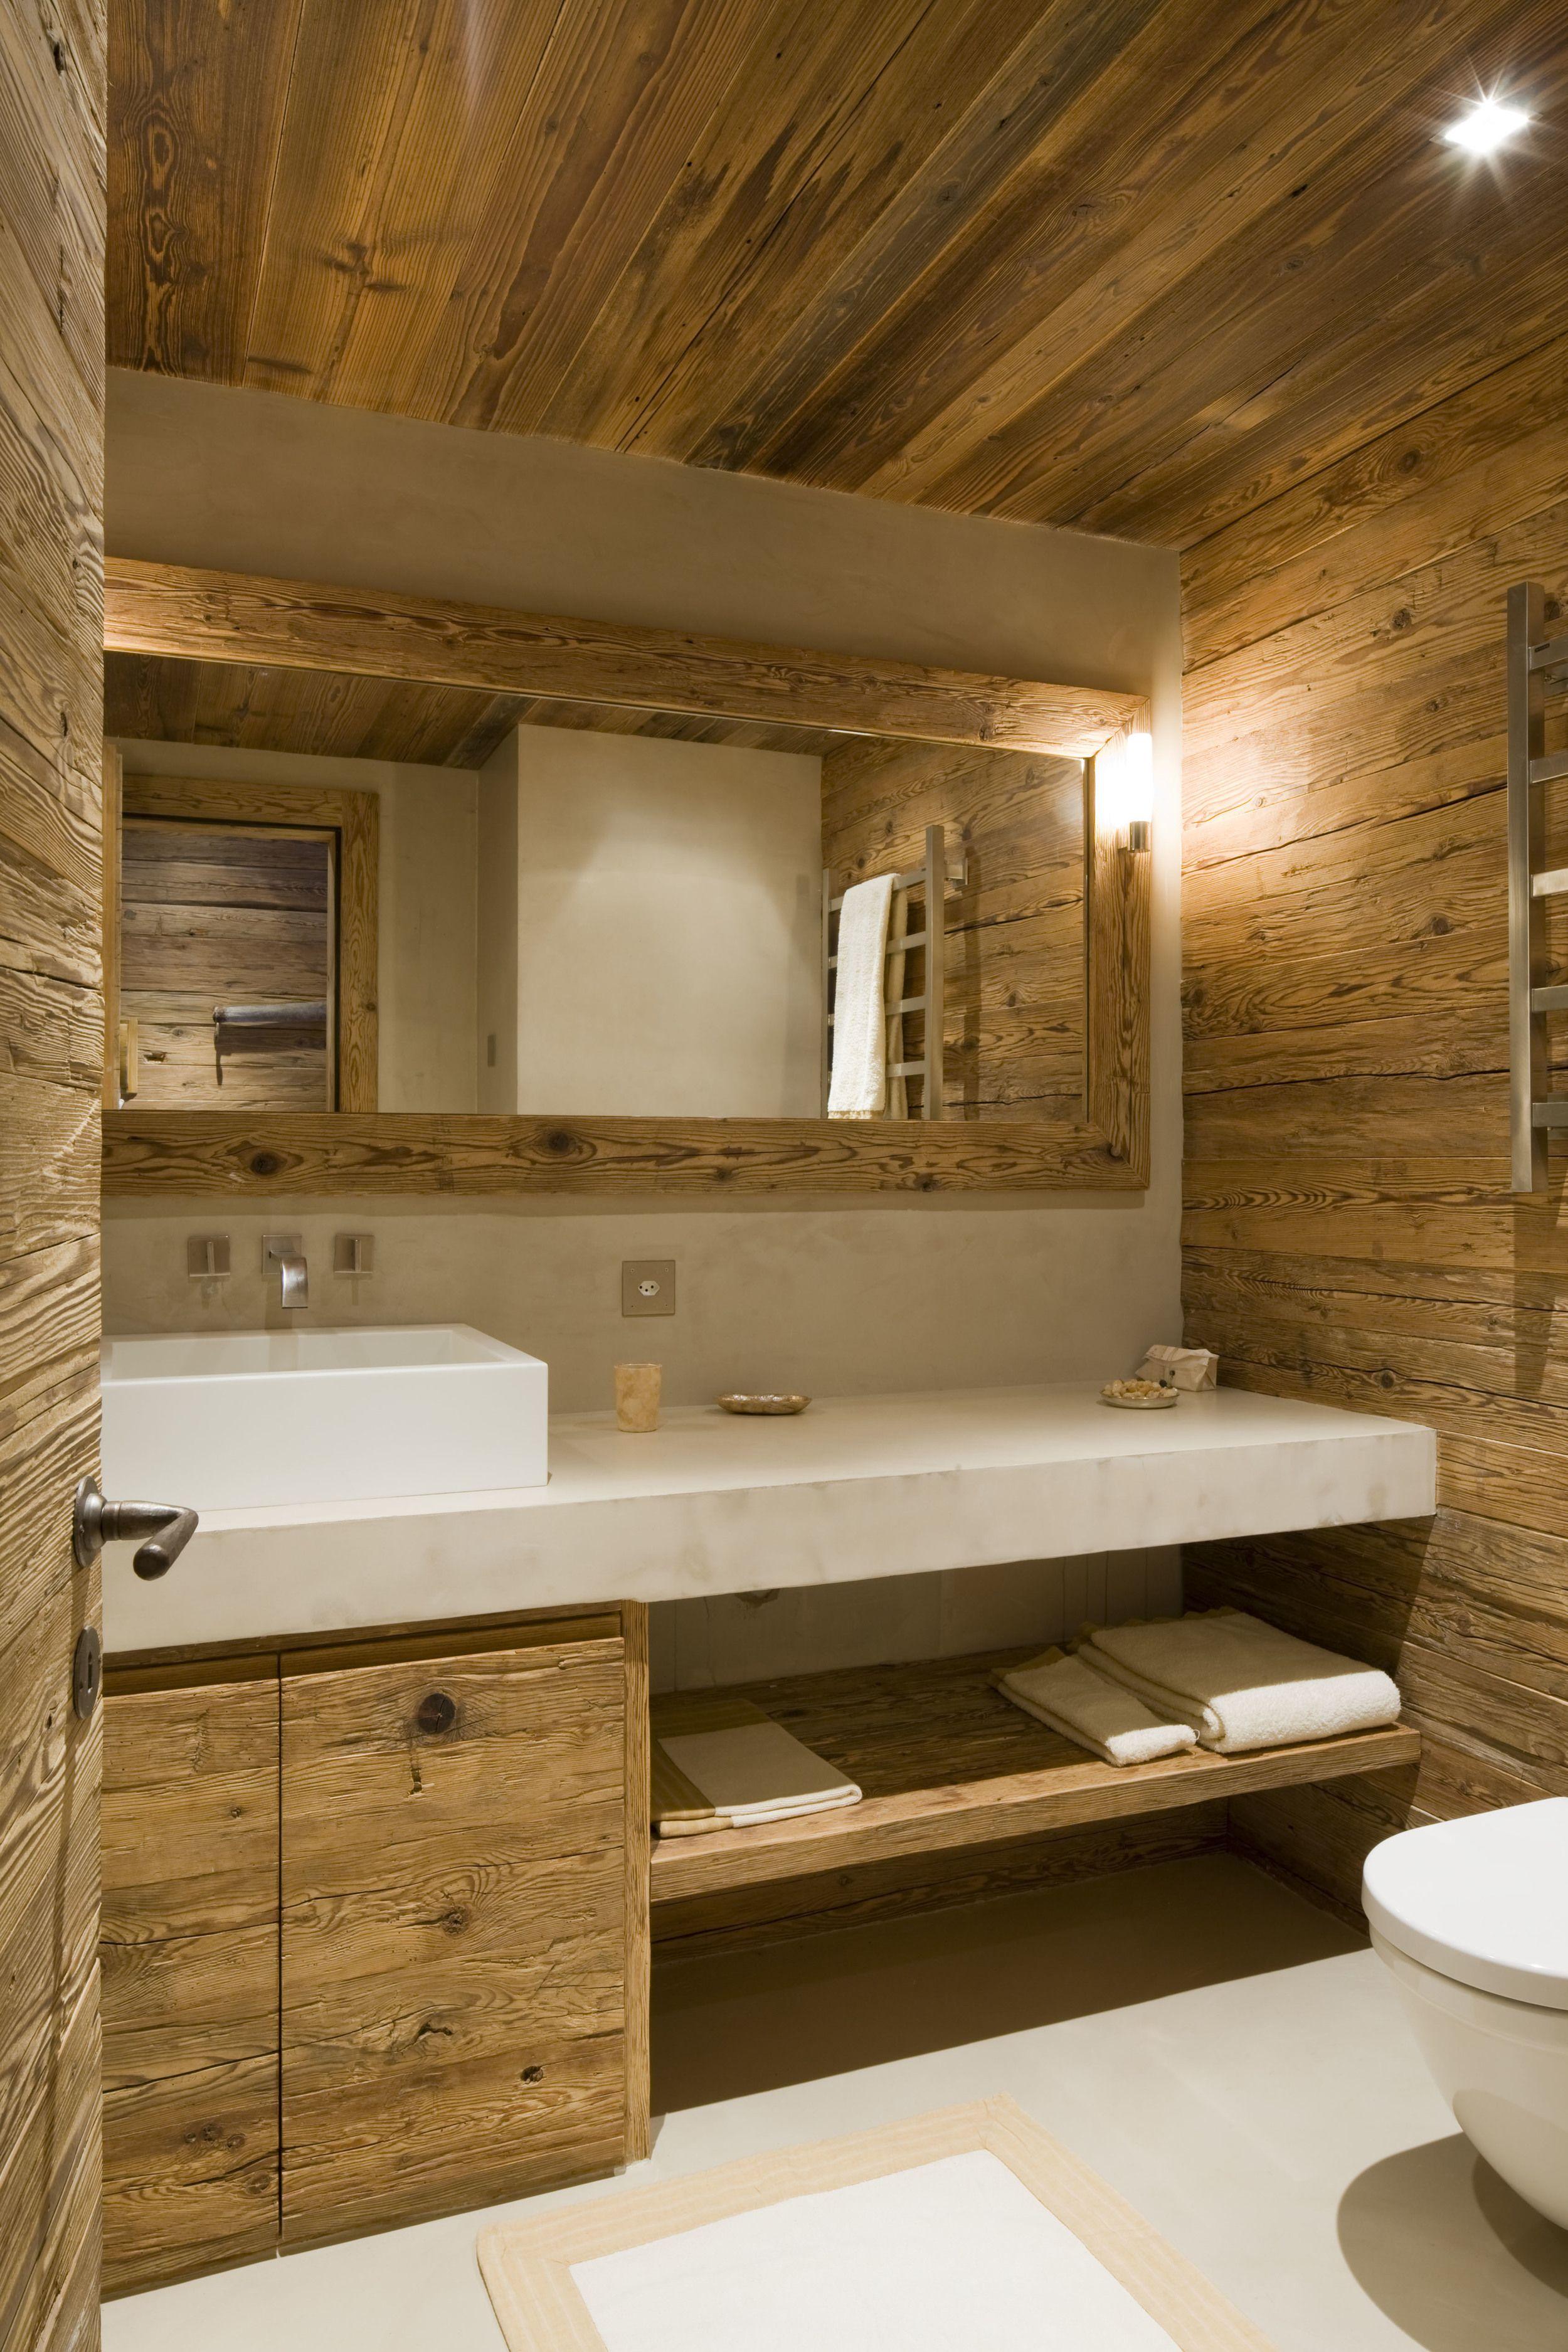 Version M Rdn 064 Jpg Badezimmer Badezimmereinrichtung Badezimmer Rustikal